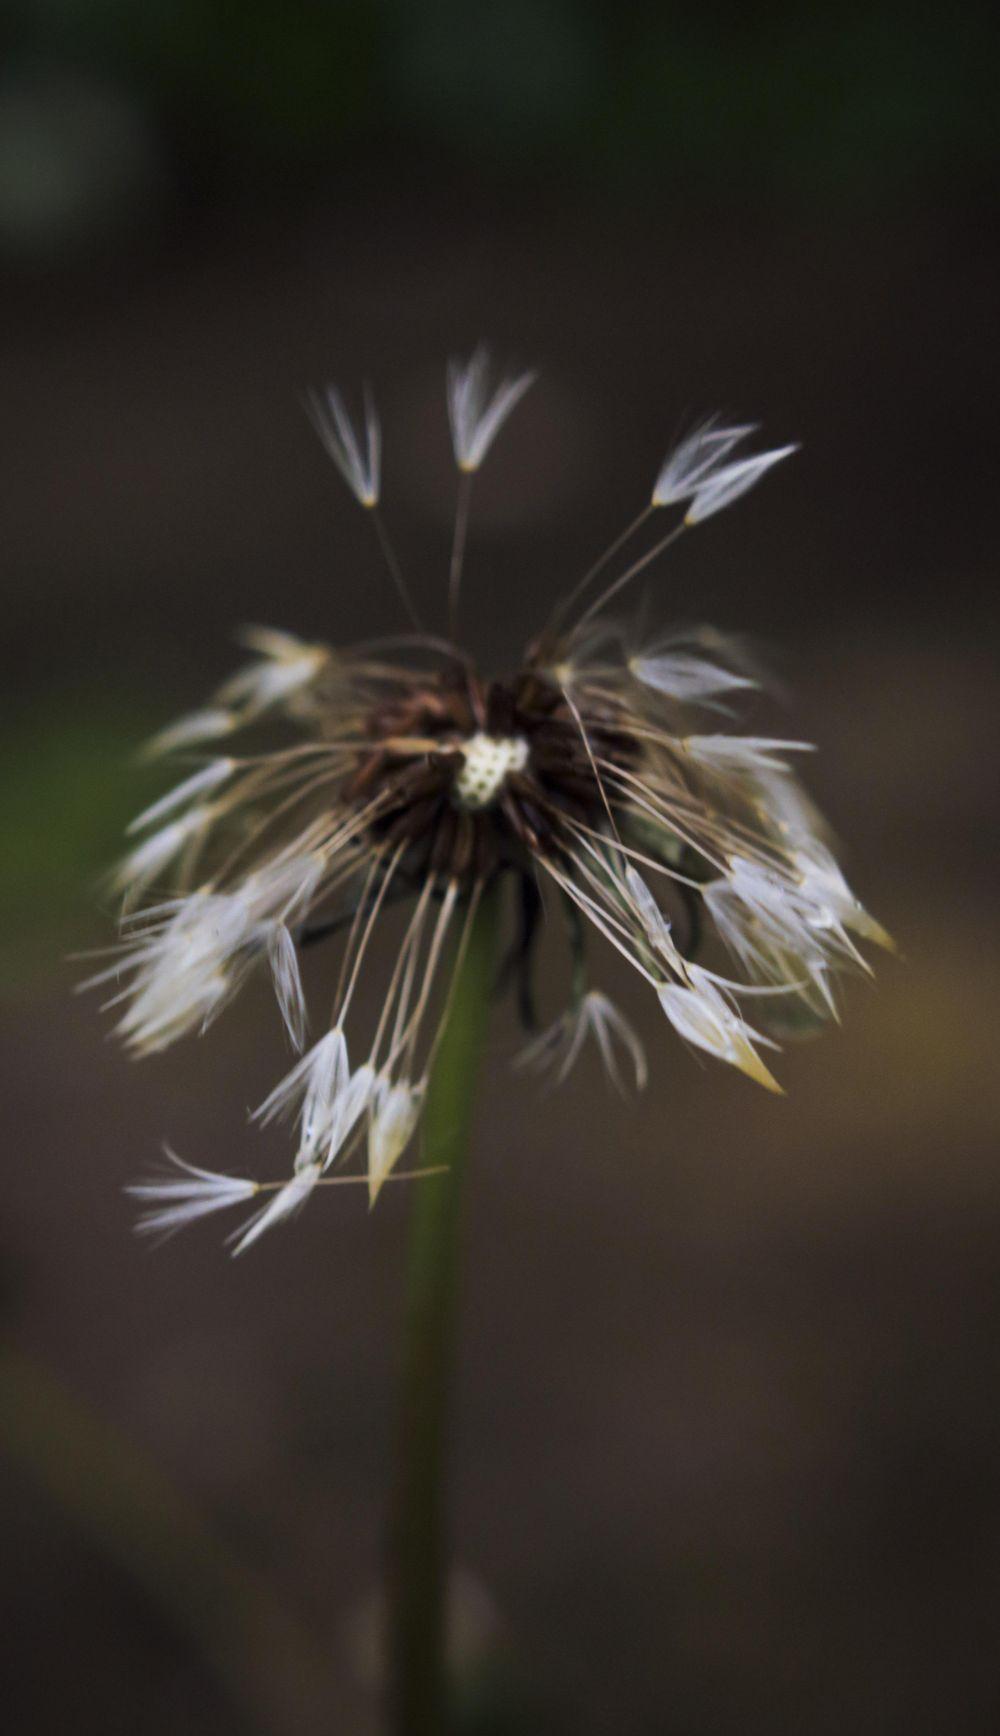 Dark & Moody Plants - image 3 - student project